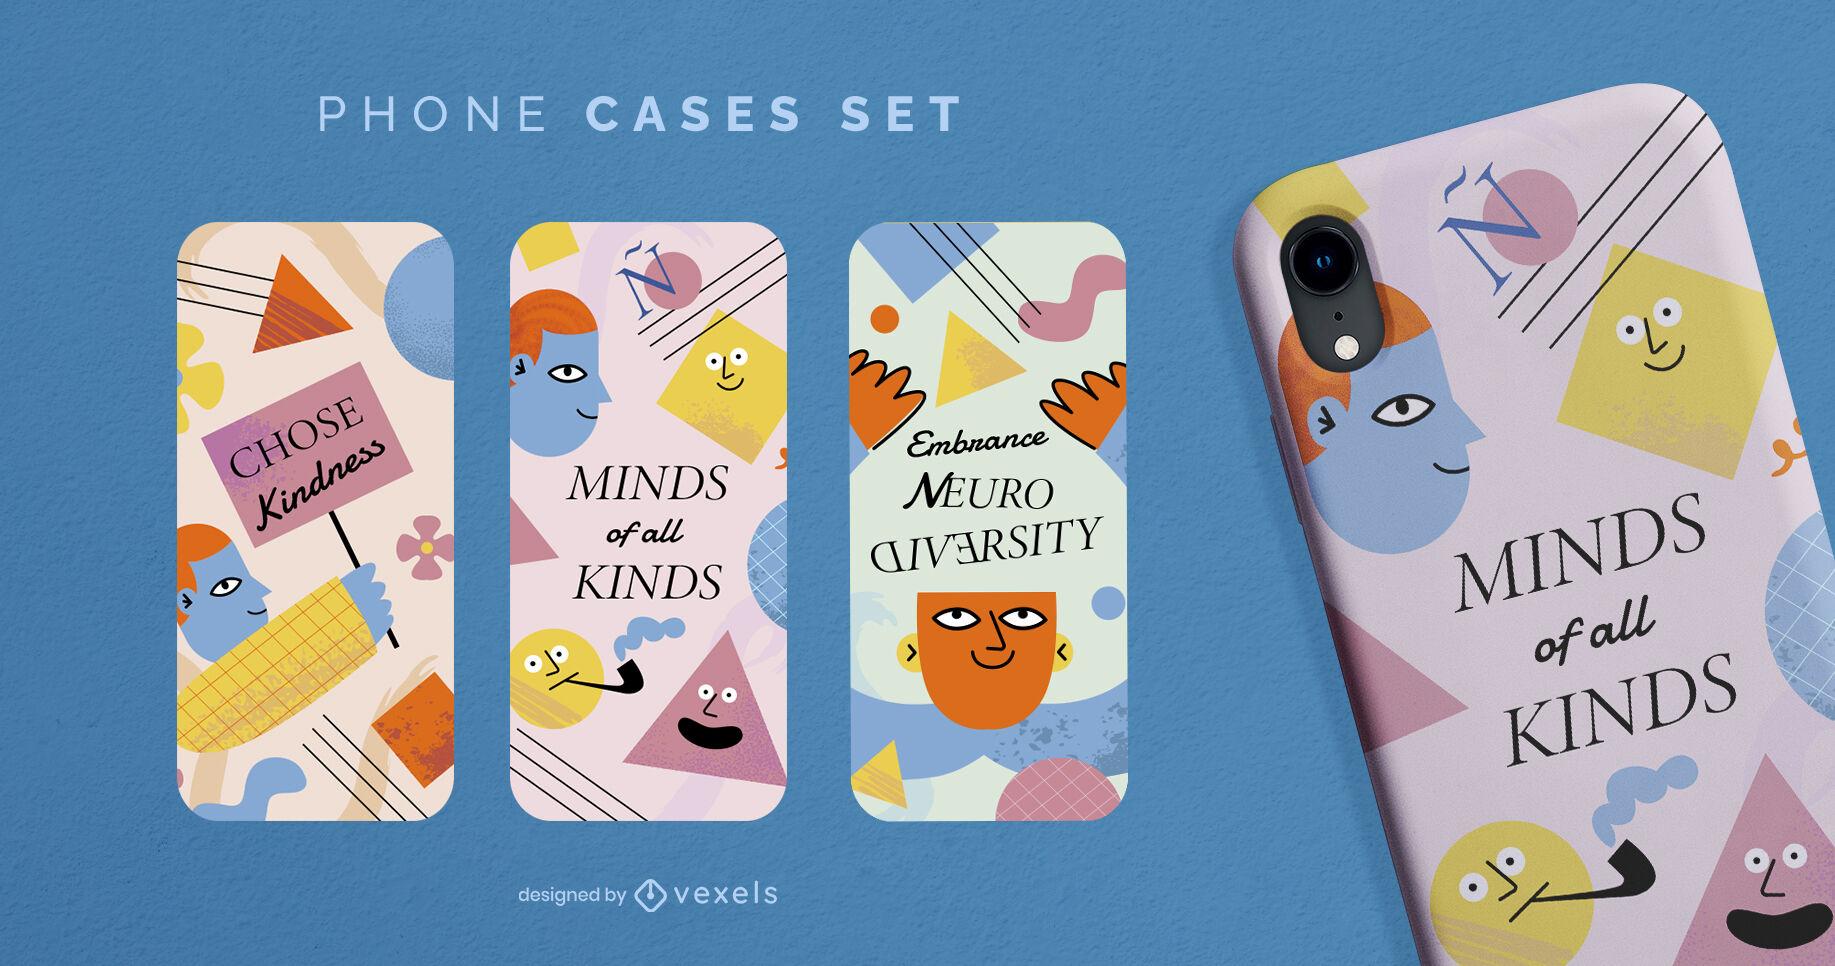 Diseño fresco de la caja del teléfono con neurodiversidad